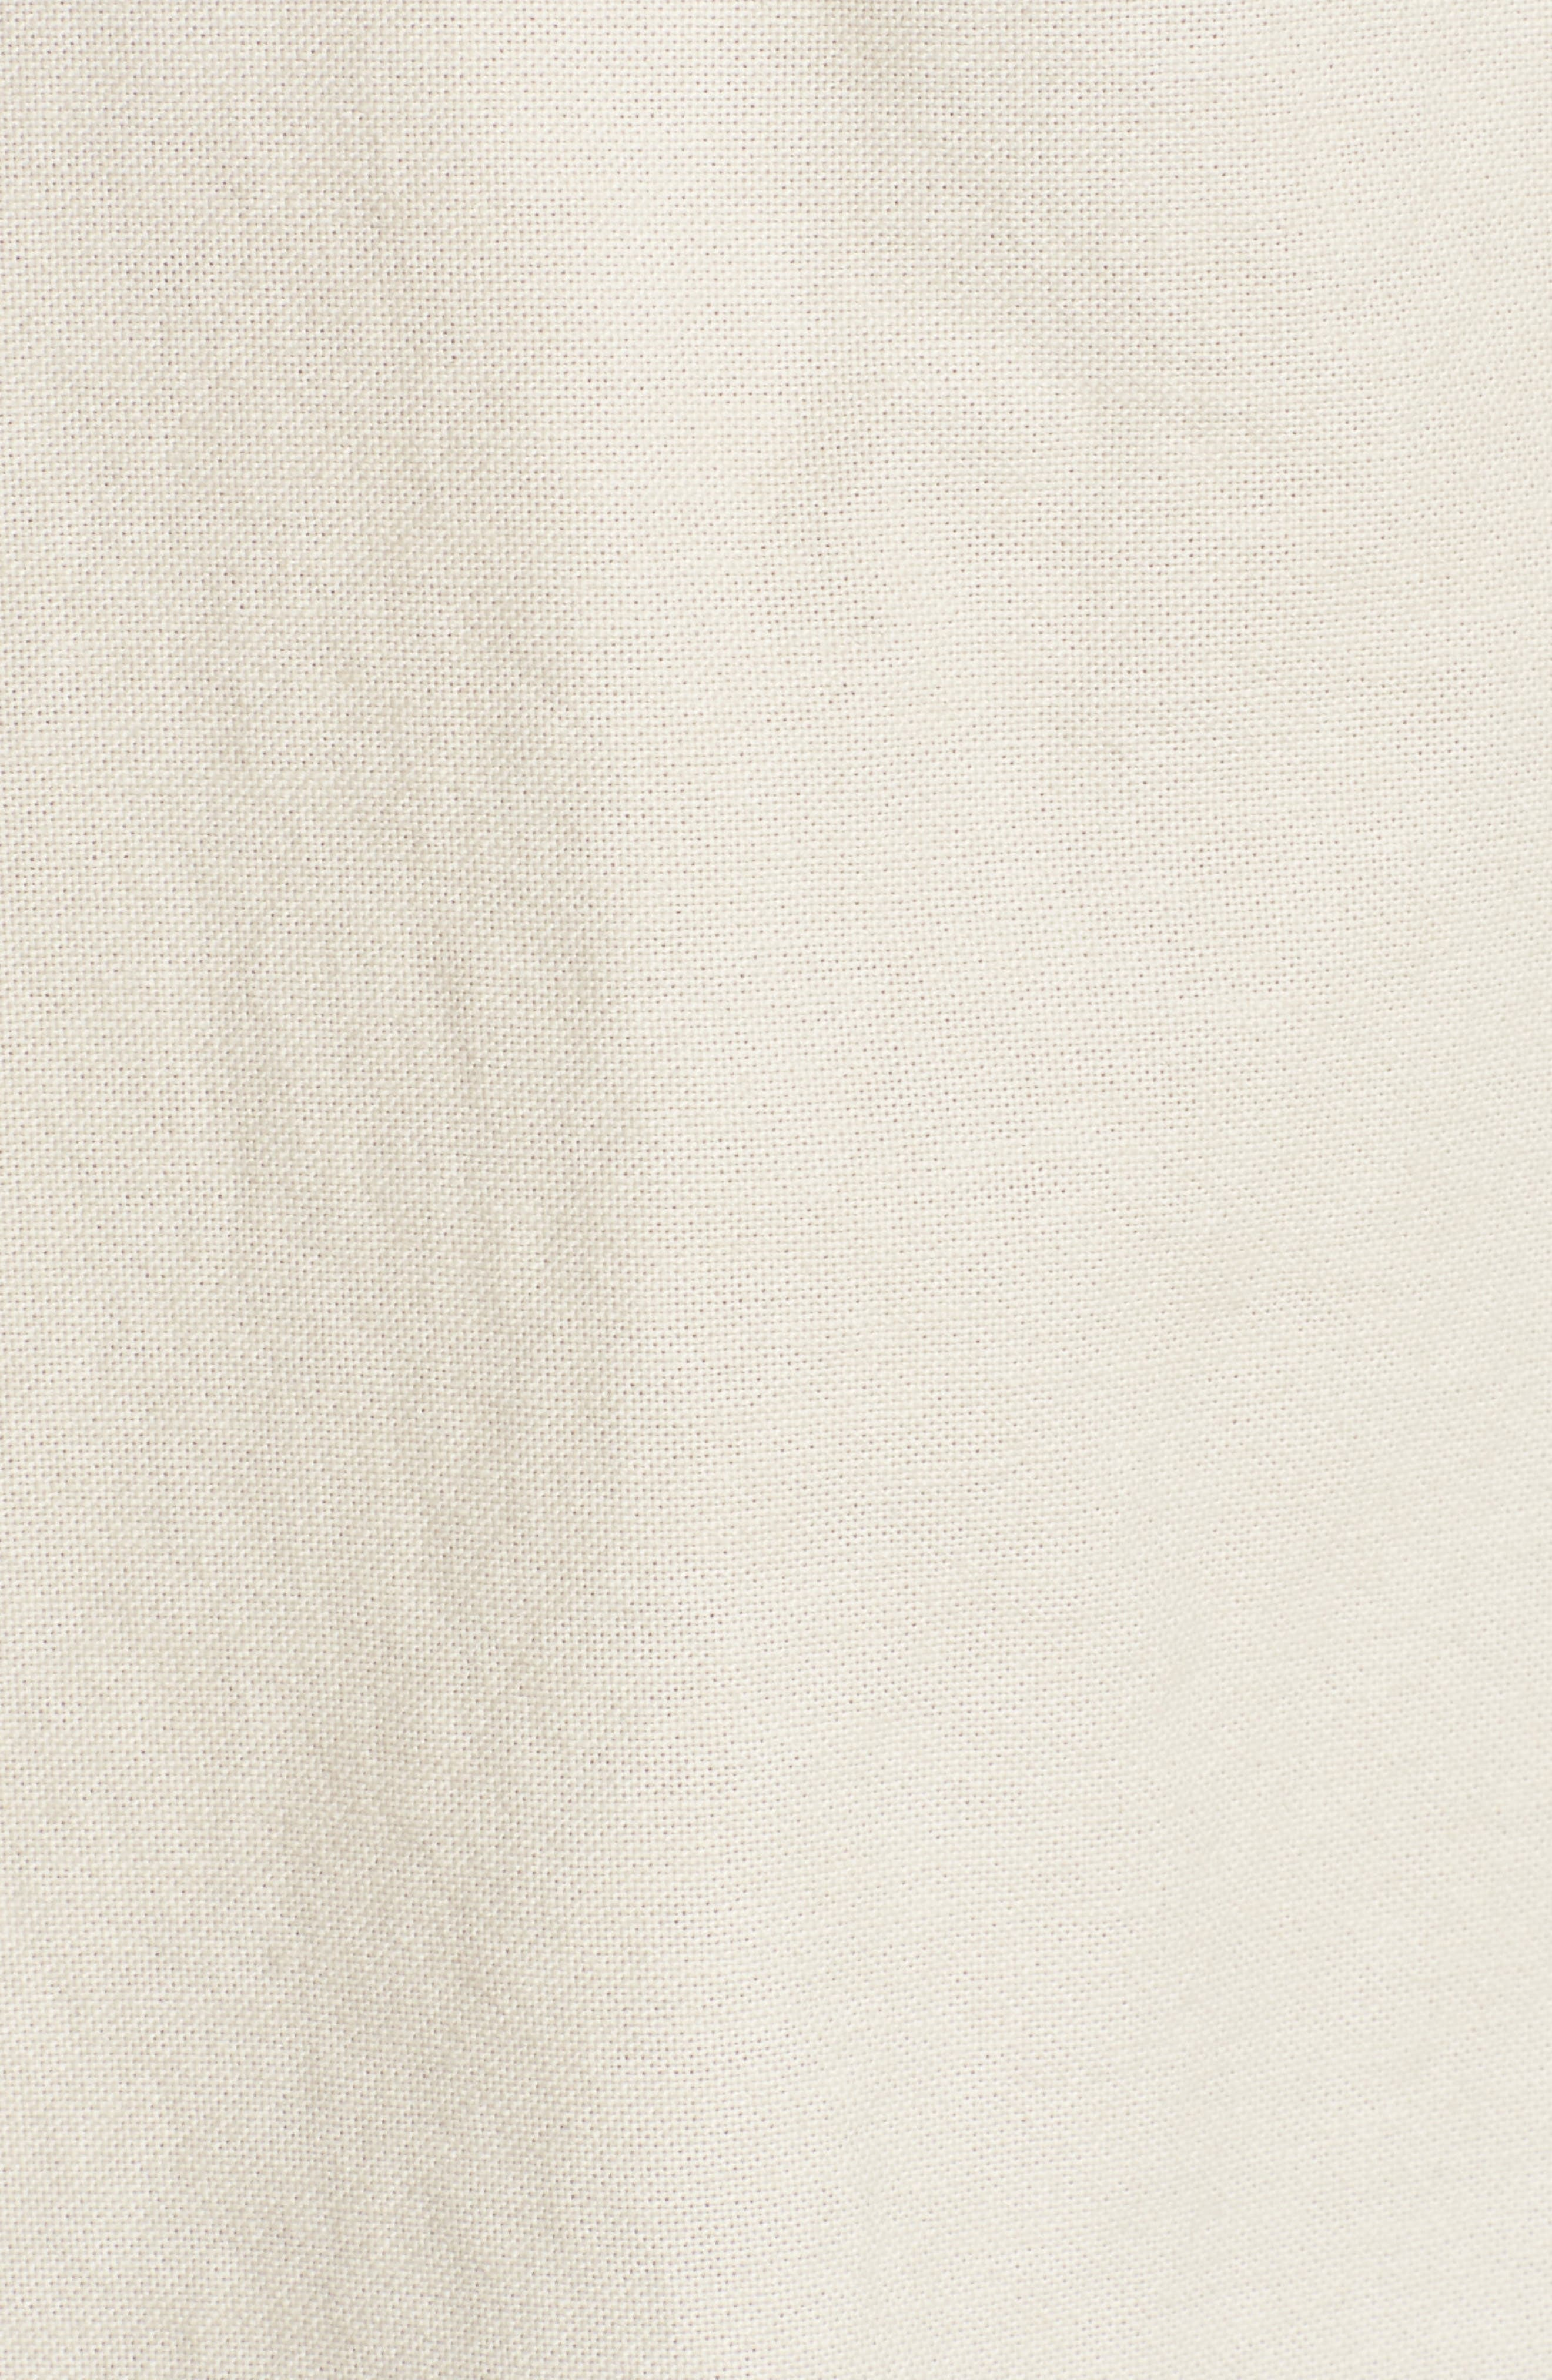 Bristol Slim Fit Sport Shirt,                             Alternate thumbnail 5, color,                             Sunbaked Mineral Veil